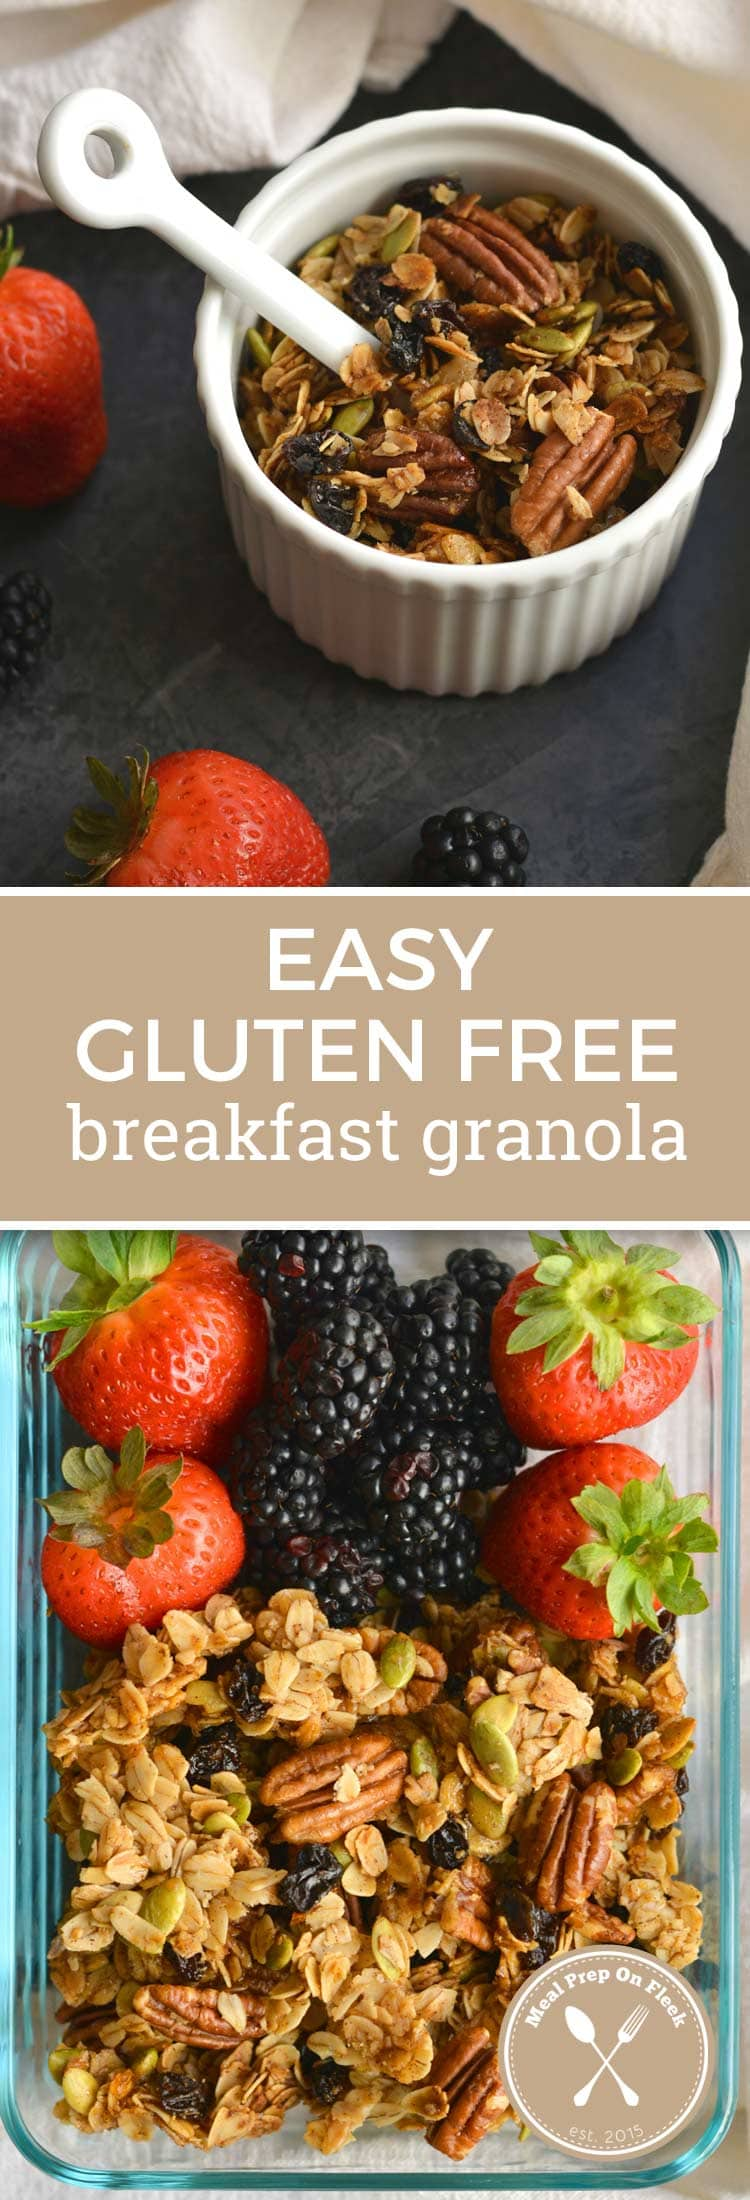 Gluten Free Snack Recipe